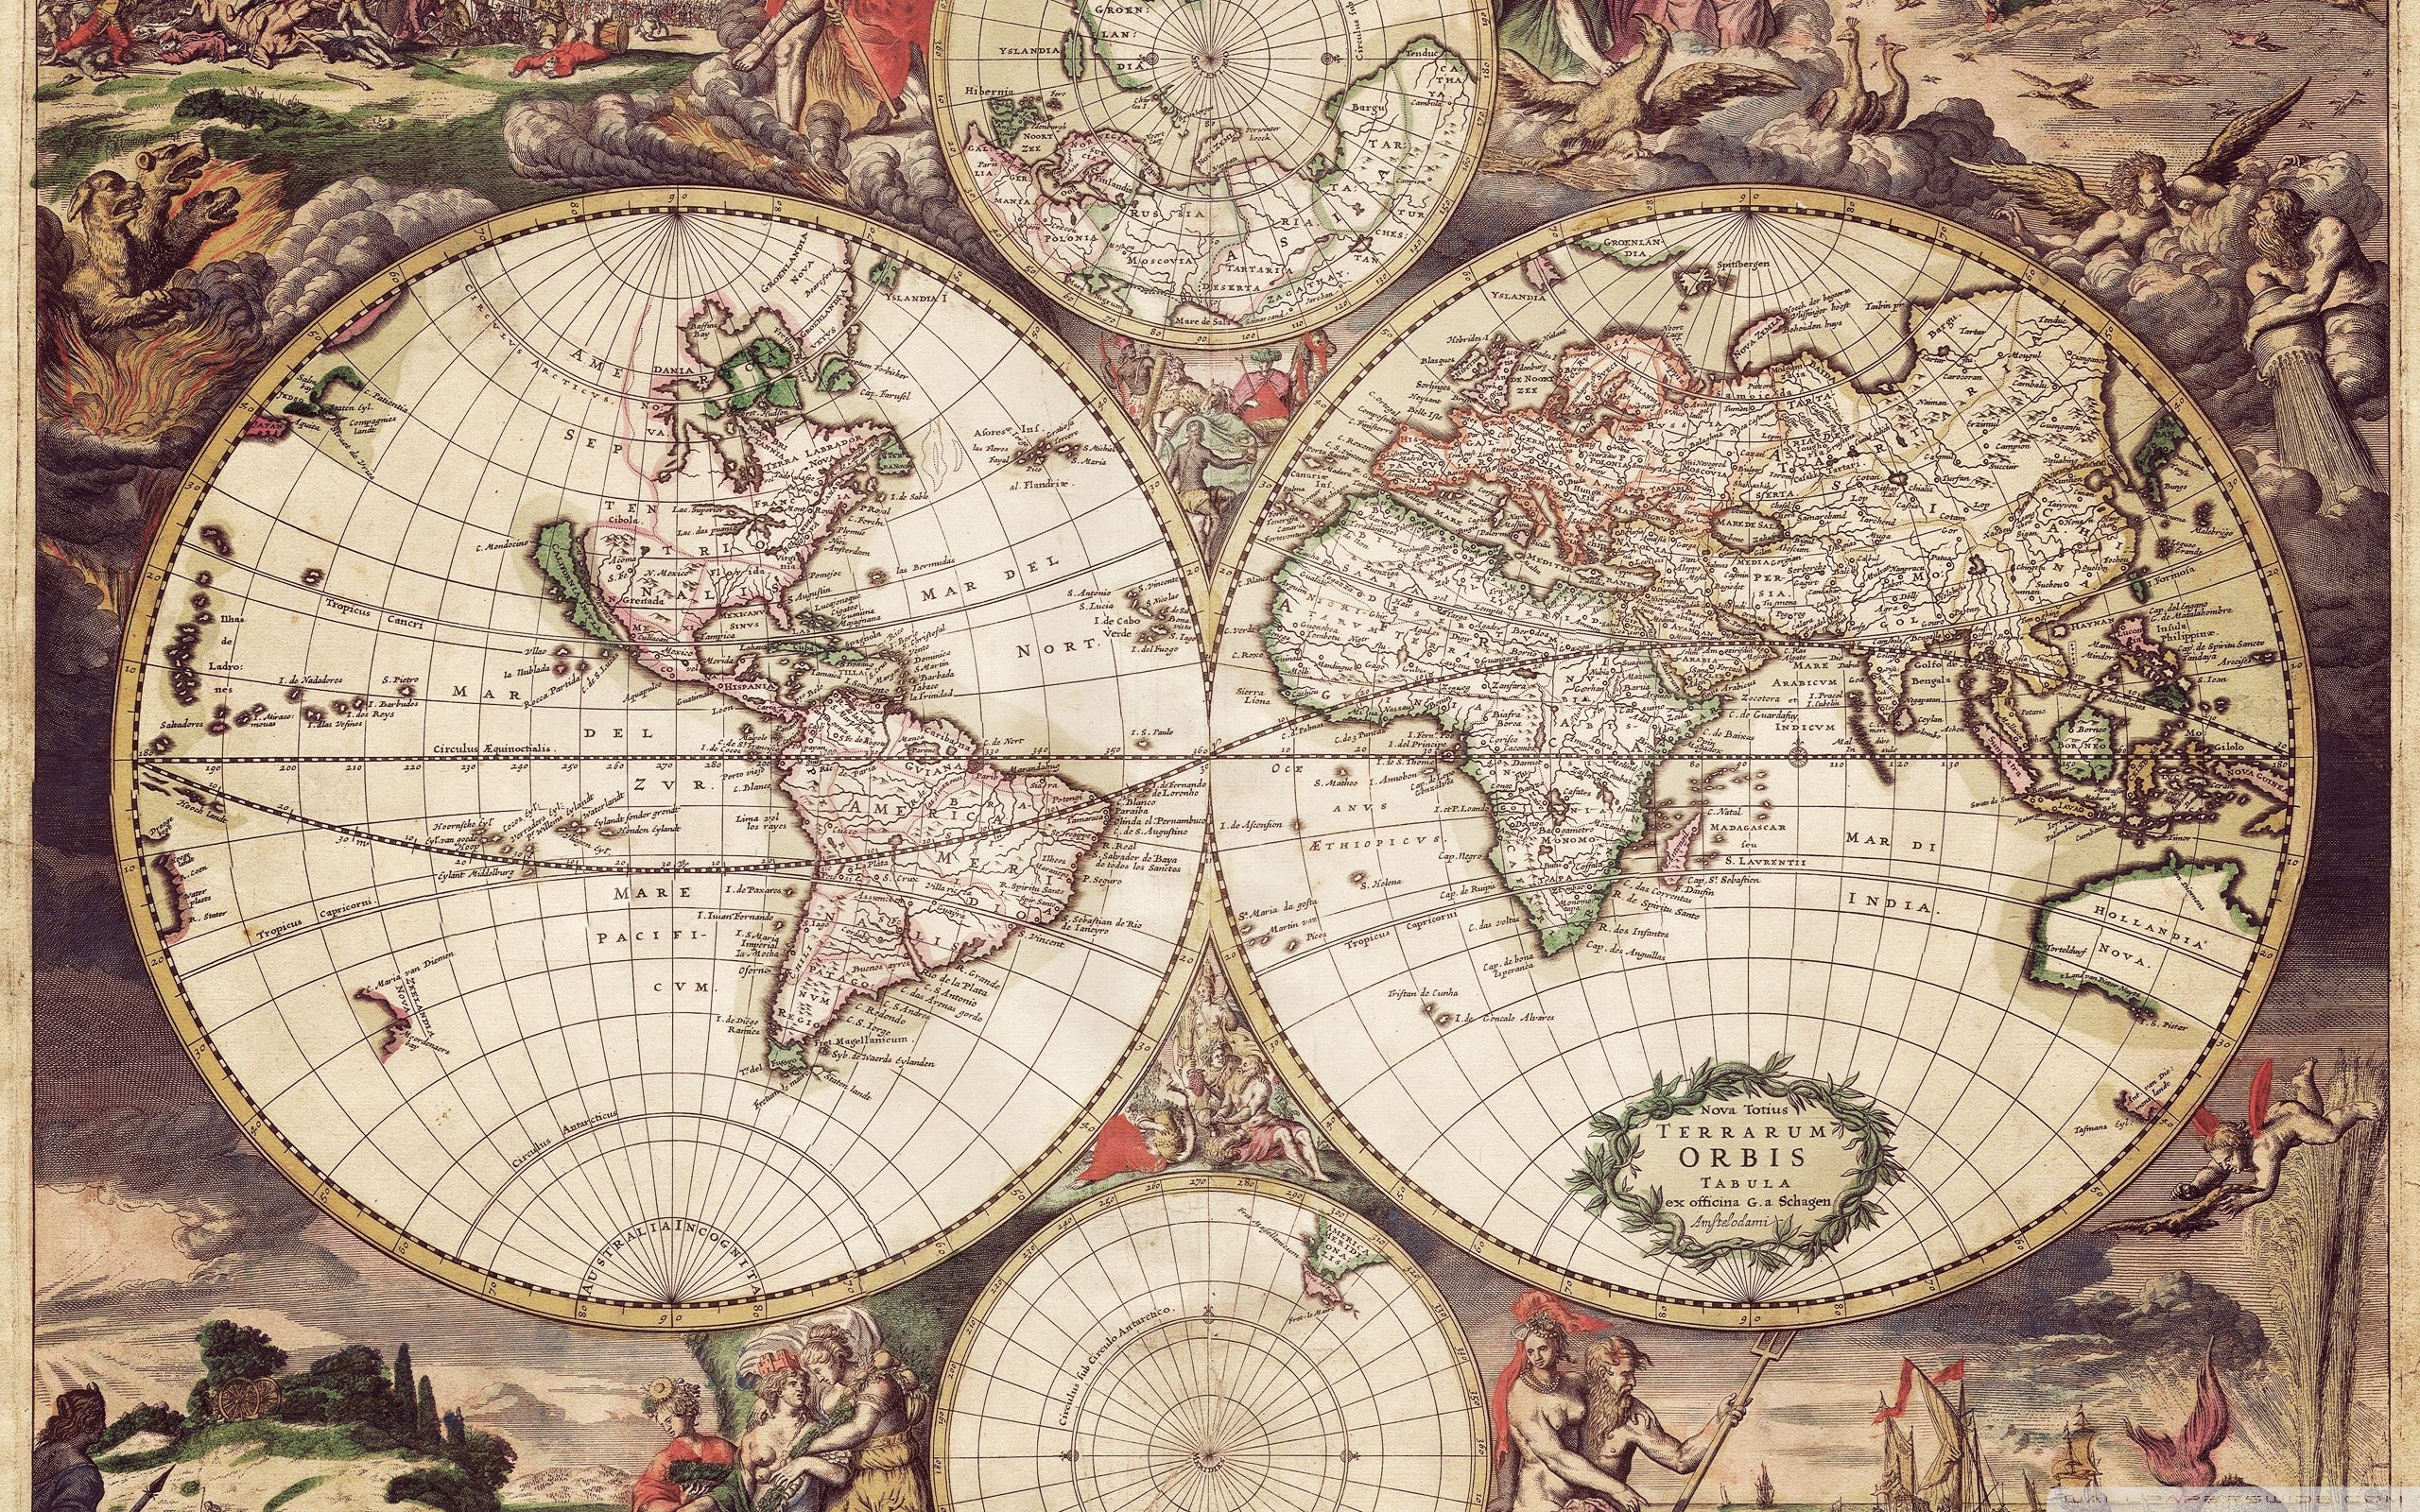 Old Earth Map HD Desktop Wallpaper Widescreen High Definition 2560x1600